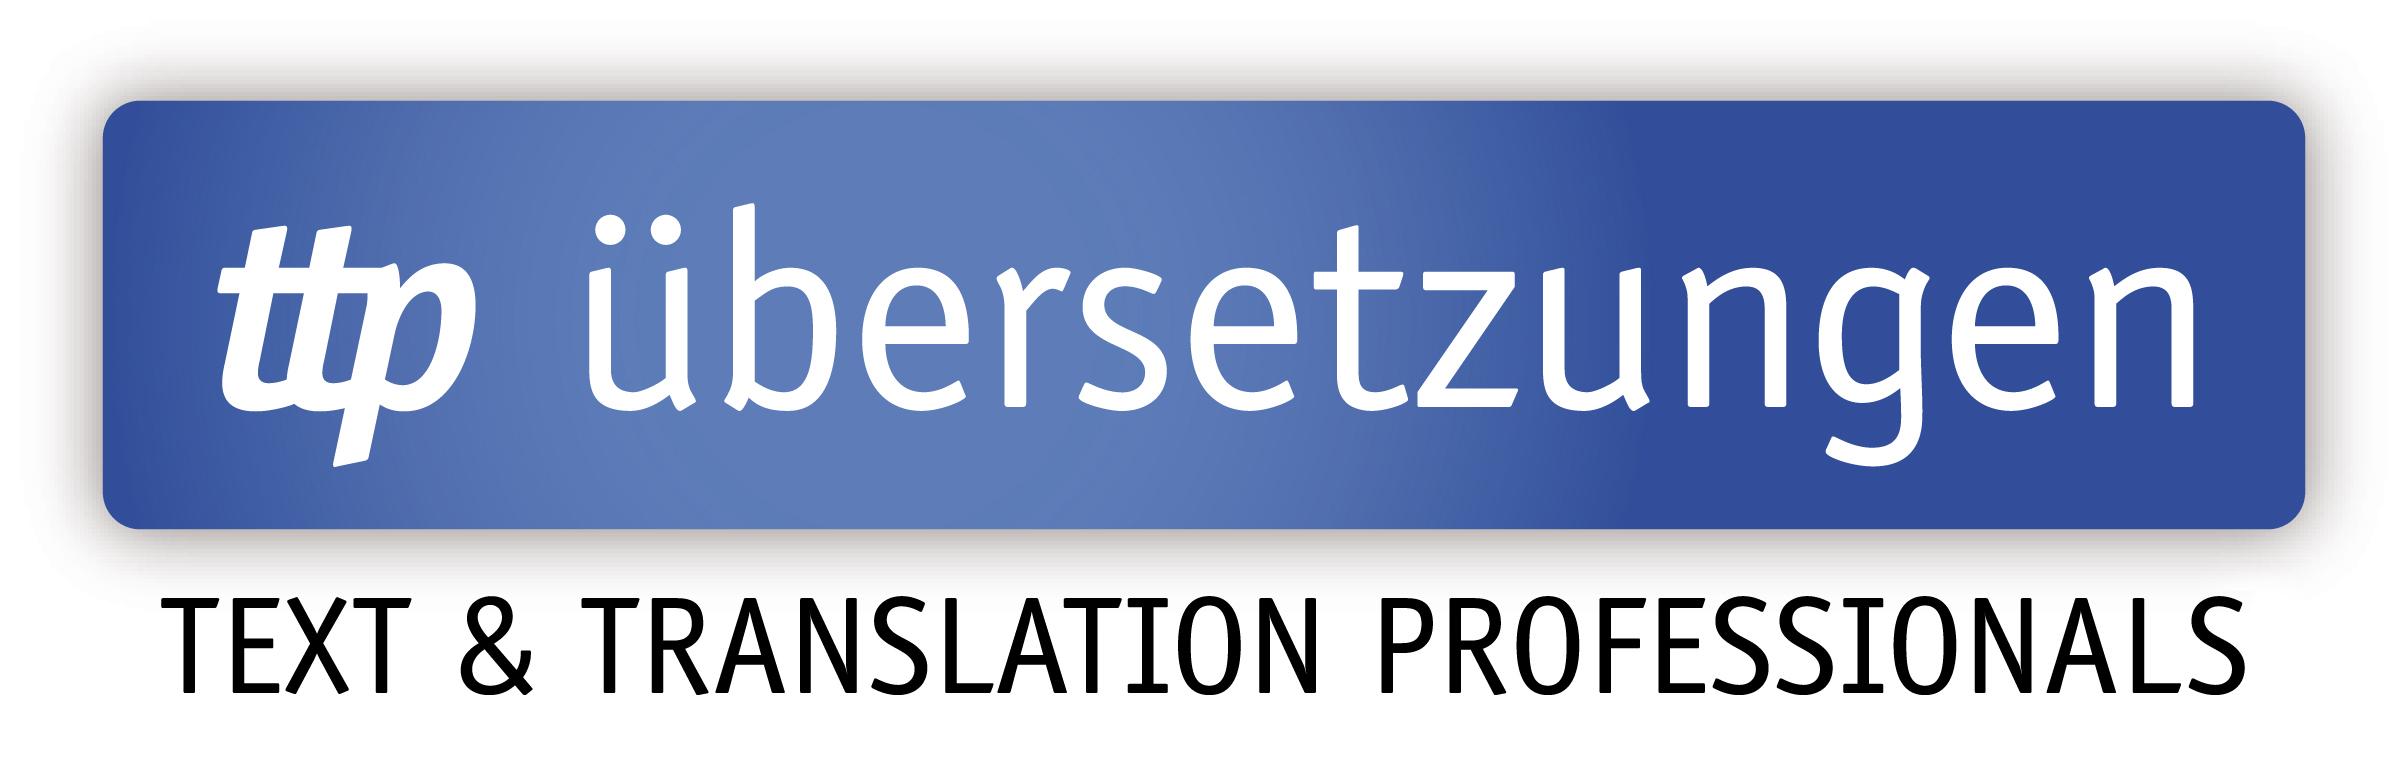 TTP Übersetzungen Paderborn